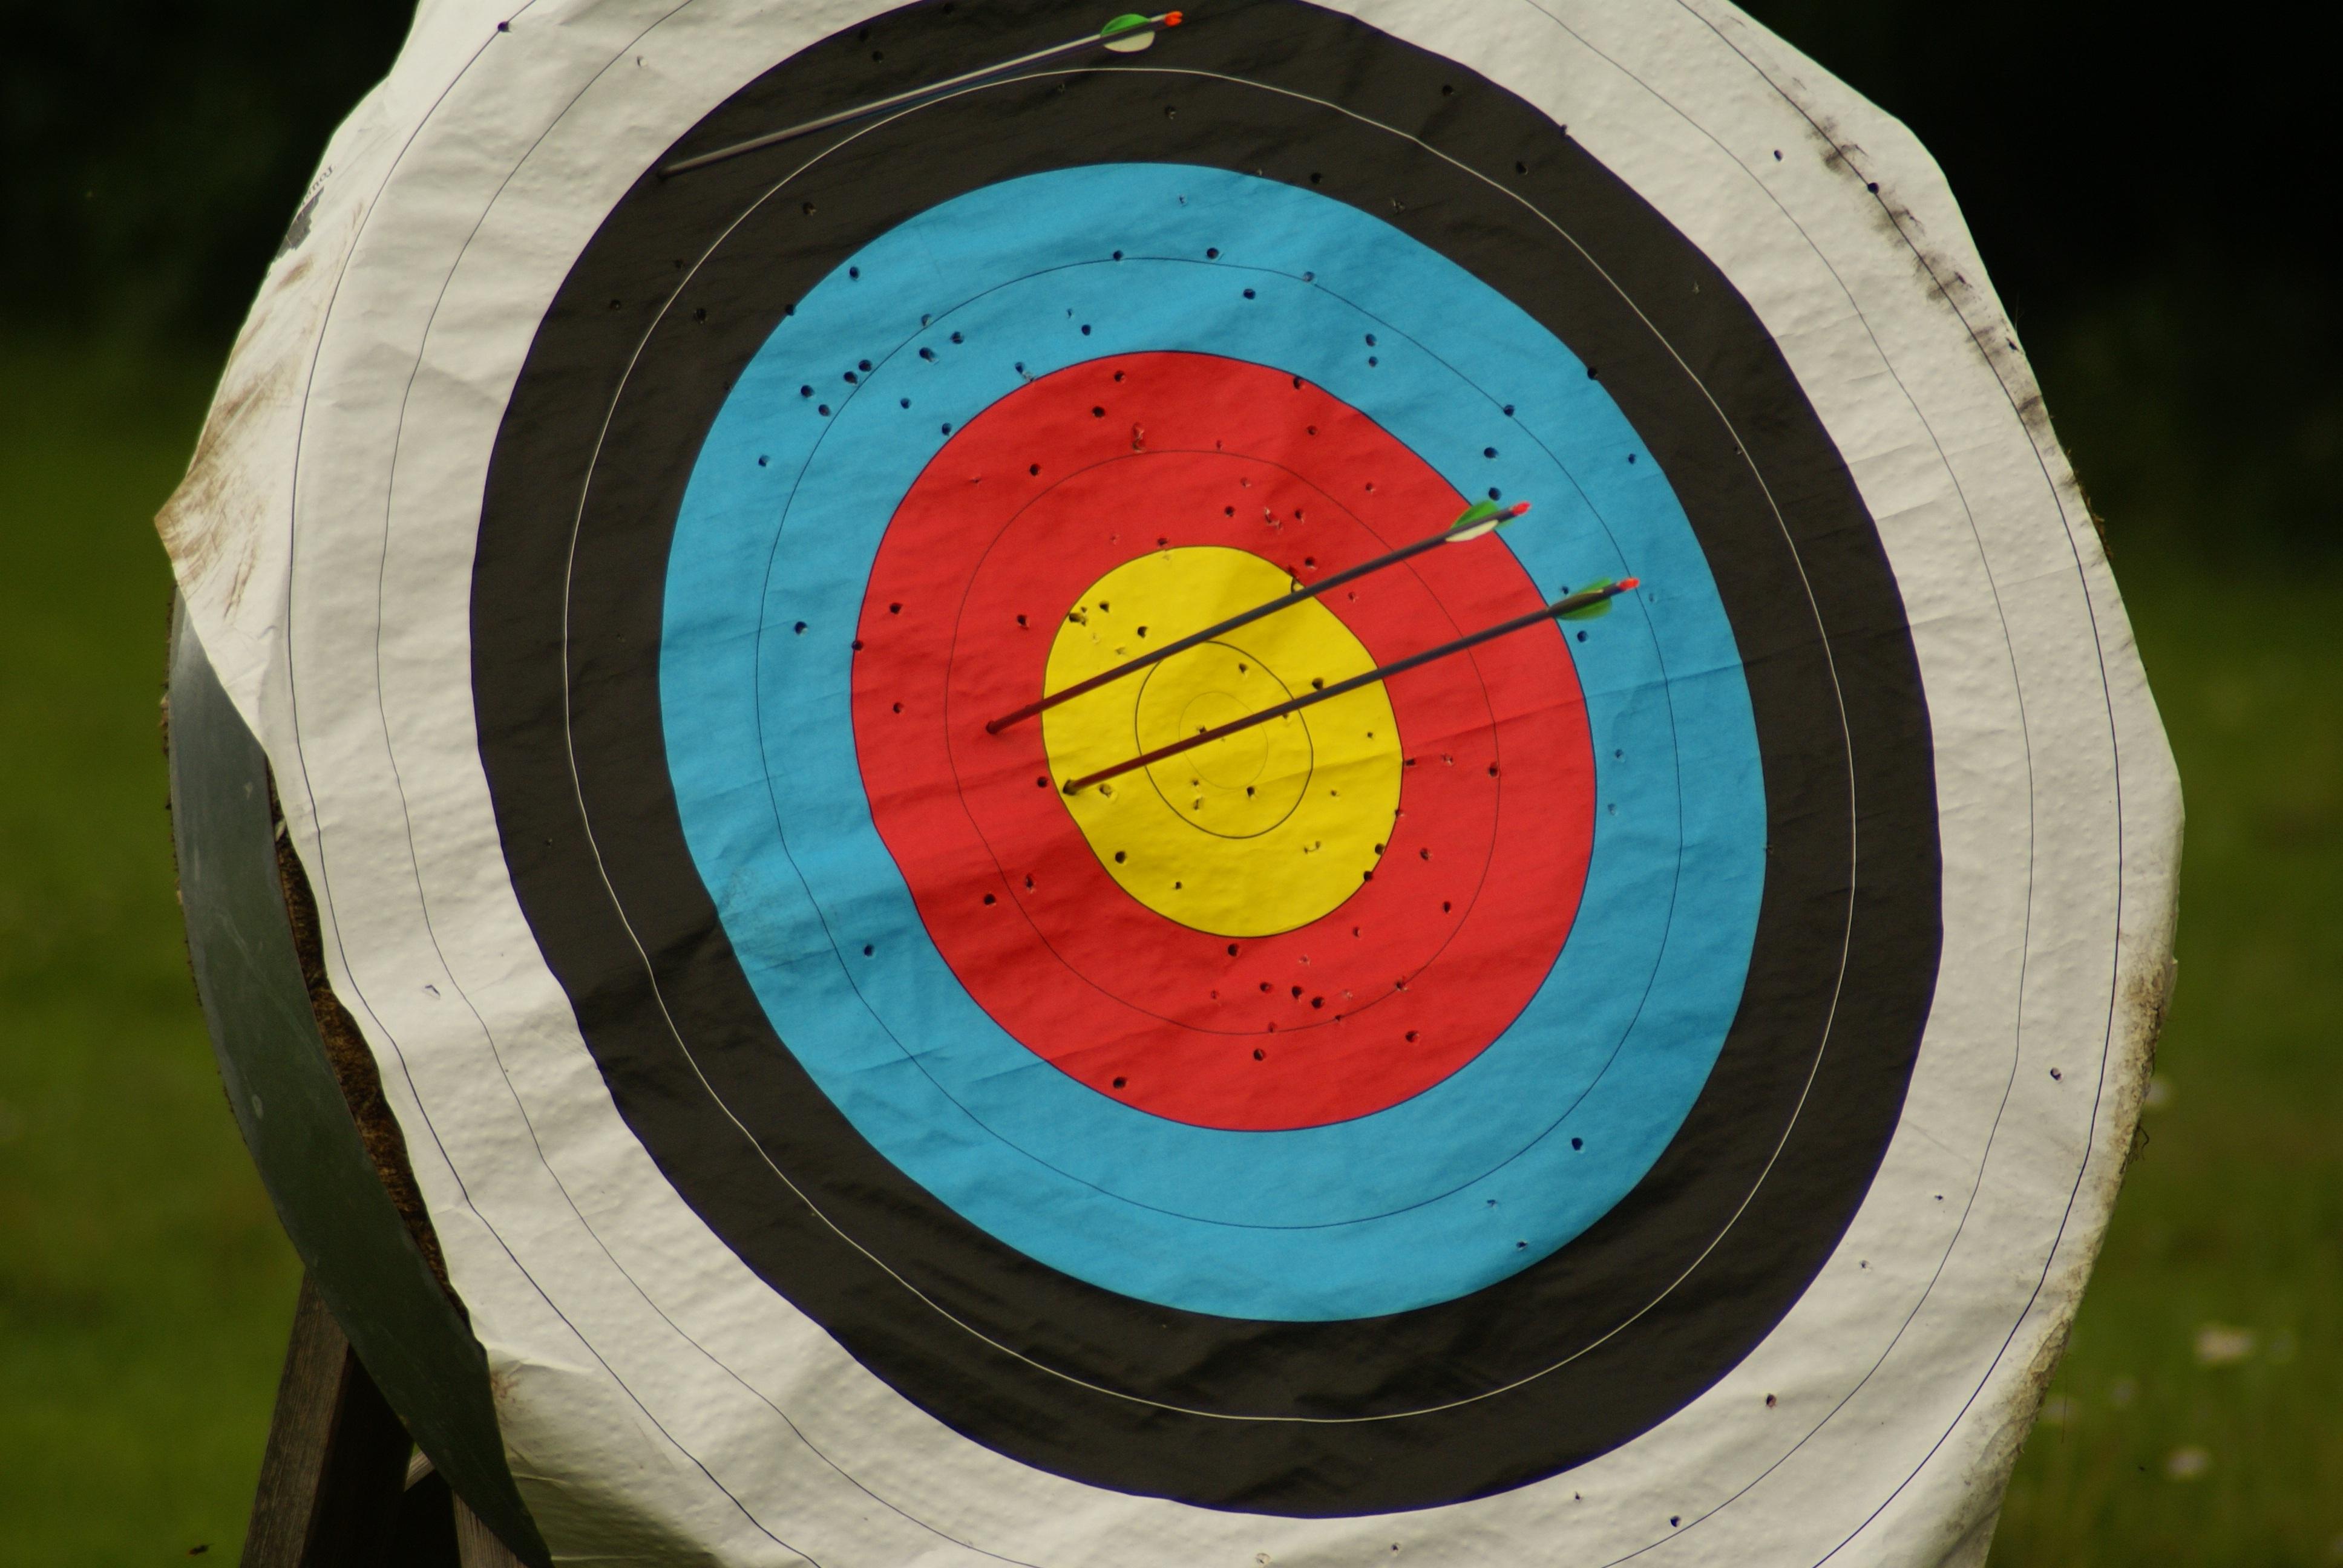 Gambar Lengkungan Hijau Warna Lingkaran Edisi Target Cakram